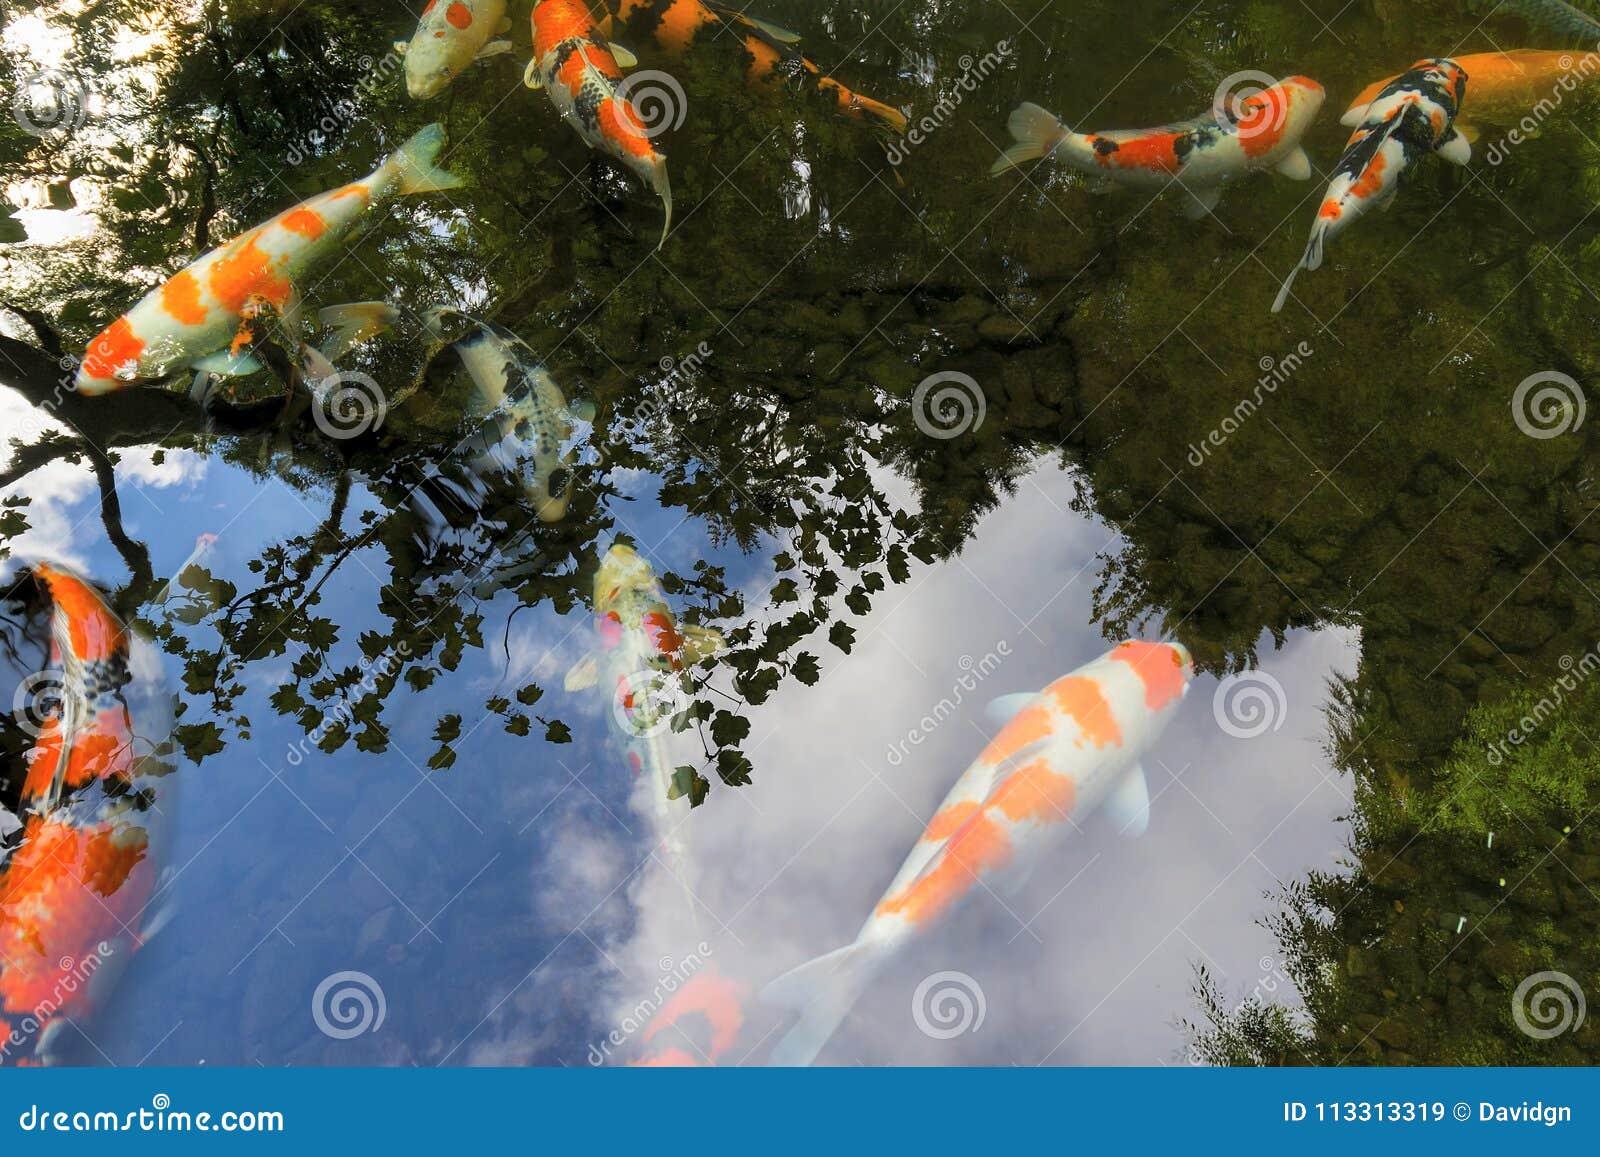 Karpers In Tuin : Koi pond reflection in japanse tuin stock afbeelding afbeelding